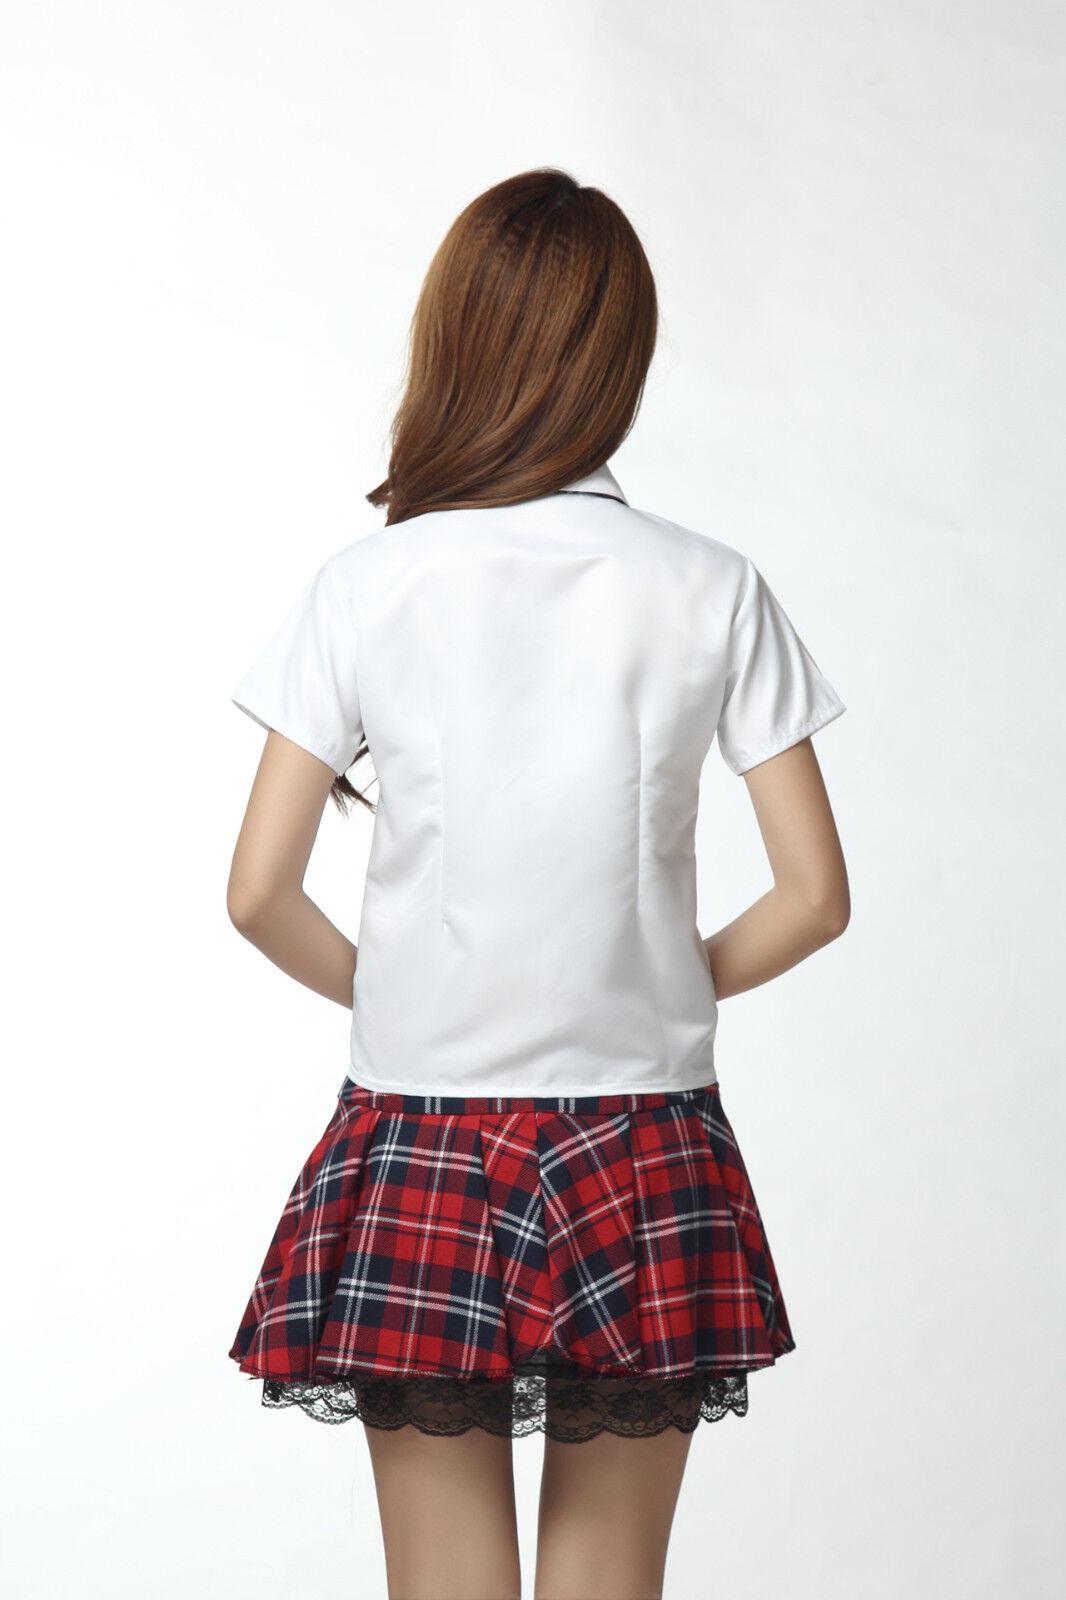 Купить Unbranded - Korean Japanese School Girl Student Uniform w/Suit Jacket Cosplay Costume White